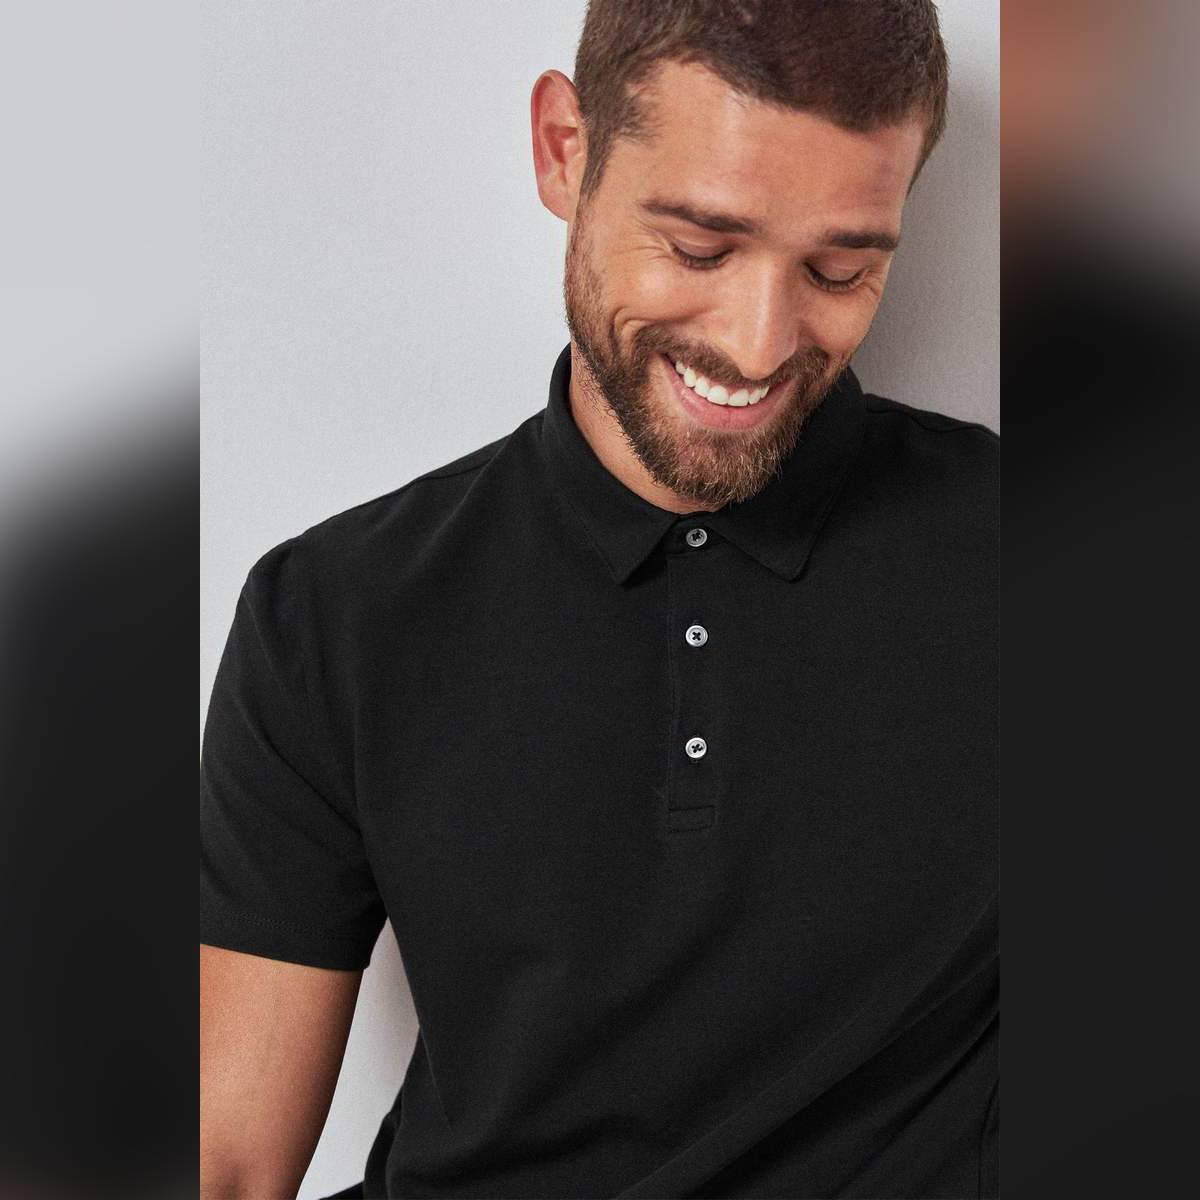 Anace Black 100% Cotton Polo Shirt for Men's